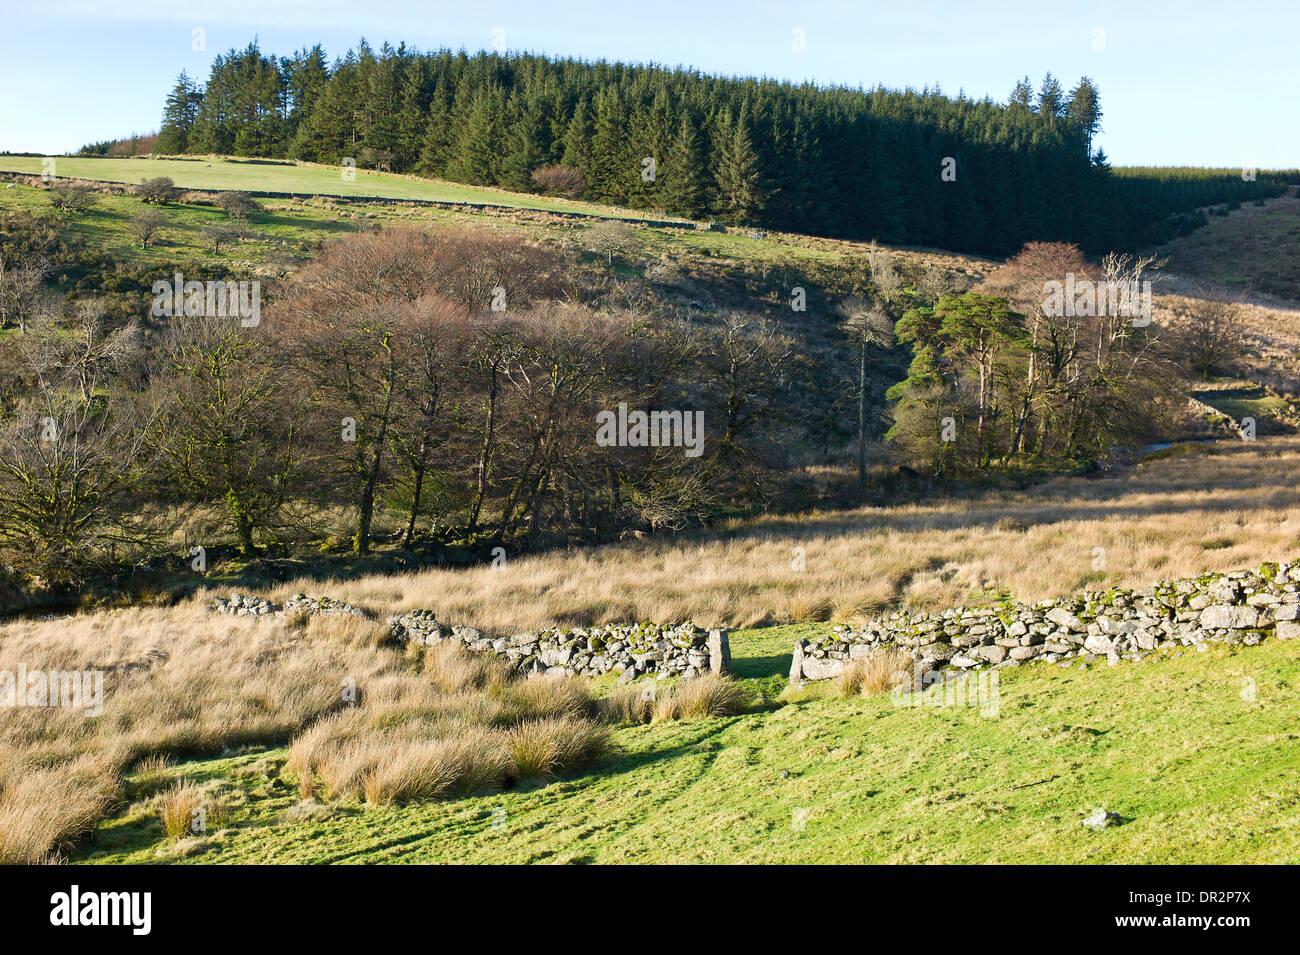 West Dart river valley and Beardown Hill near Two Bridges, Dartmoor, Devon, England - Stock Image